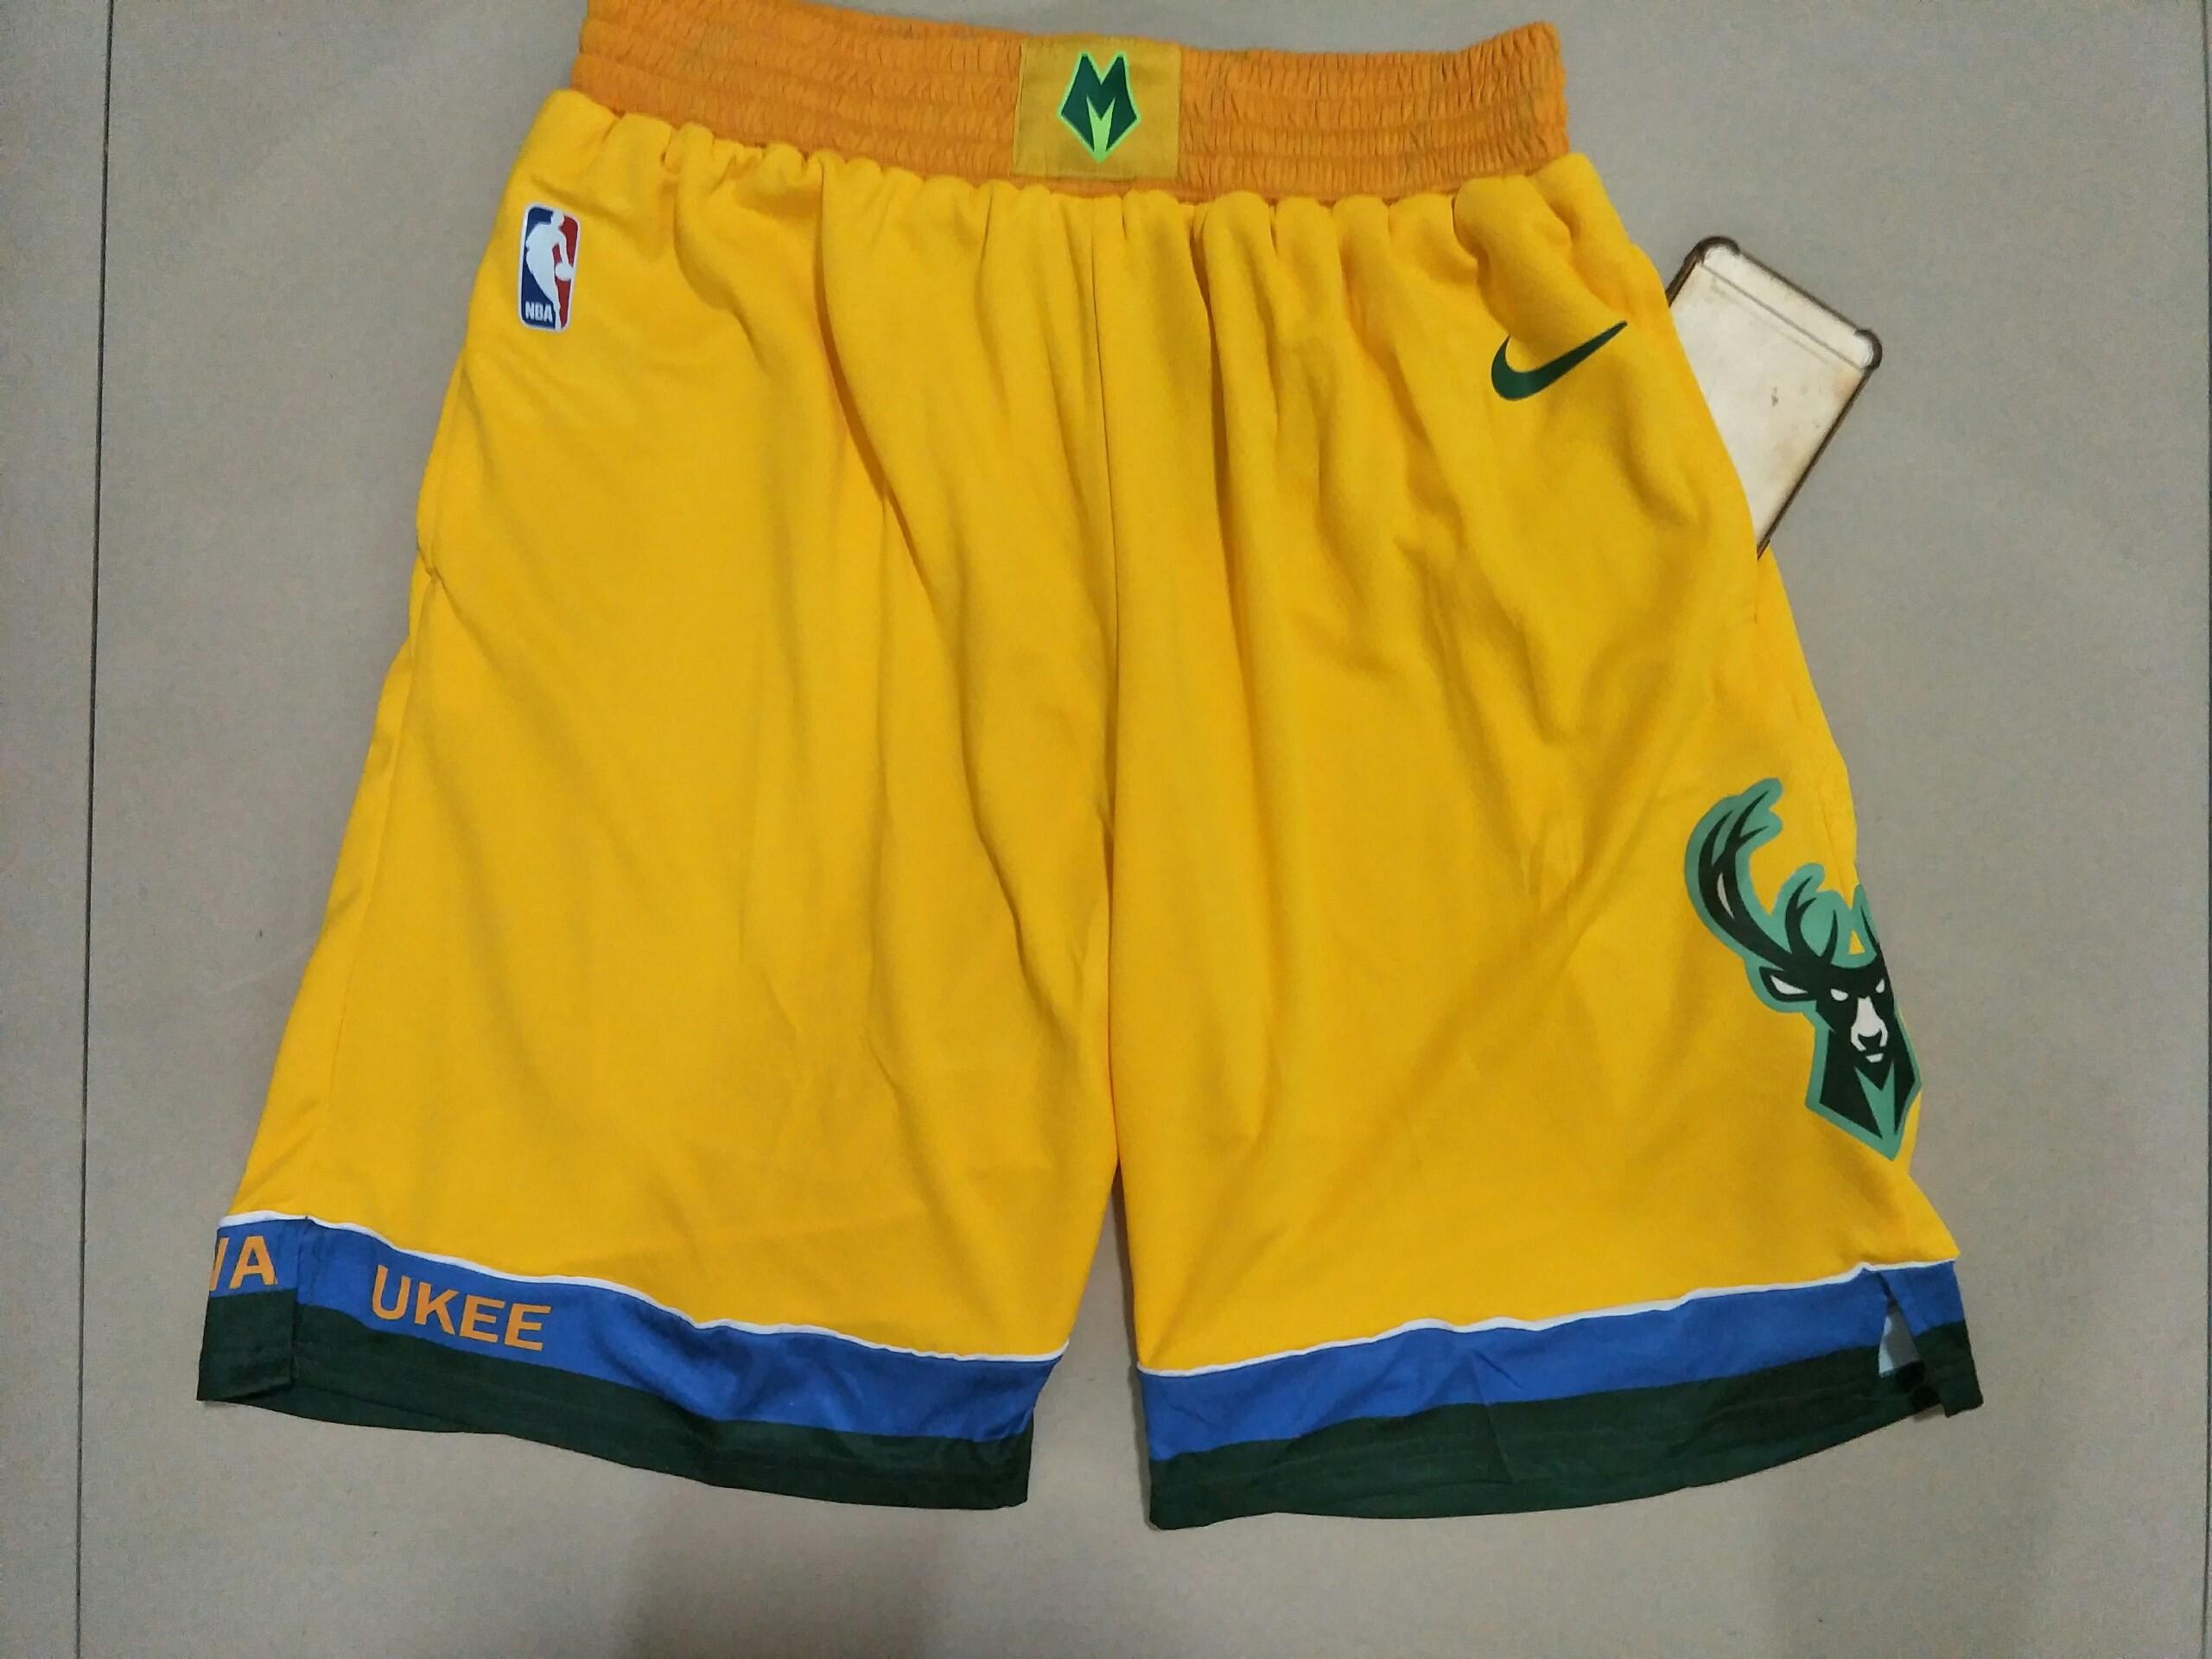 Bucks Yellow City Edition With Pocket Nike Swingman Shorts